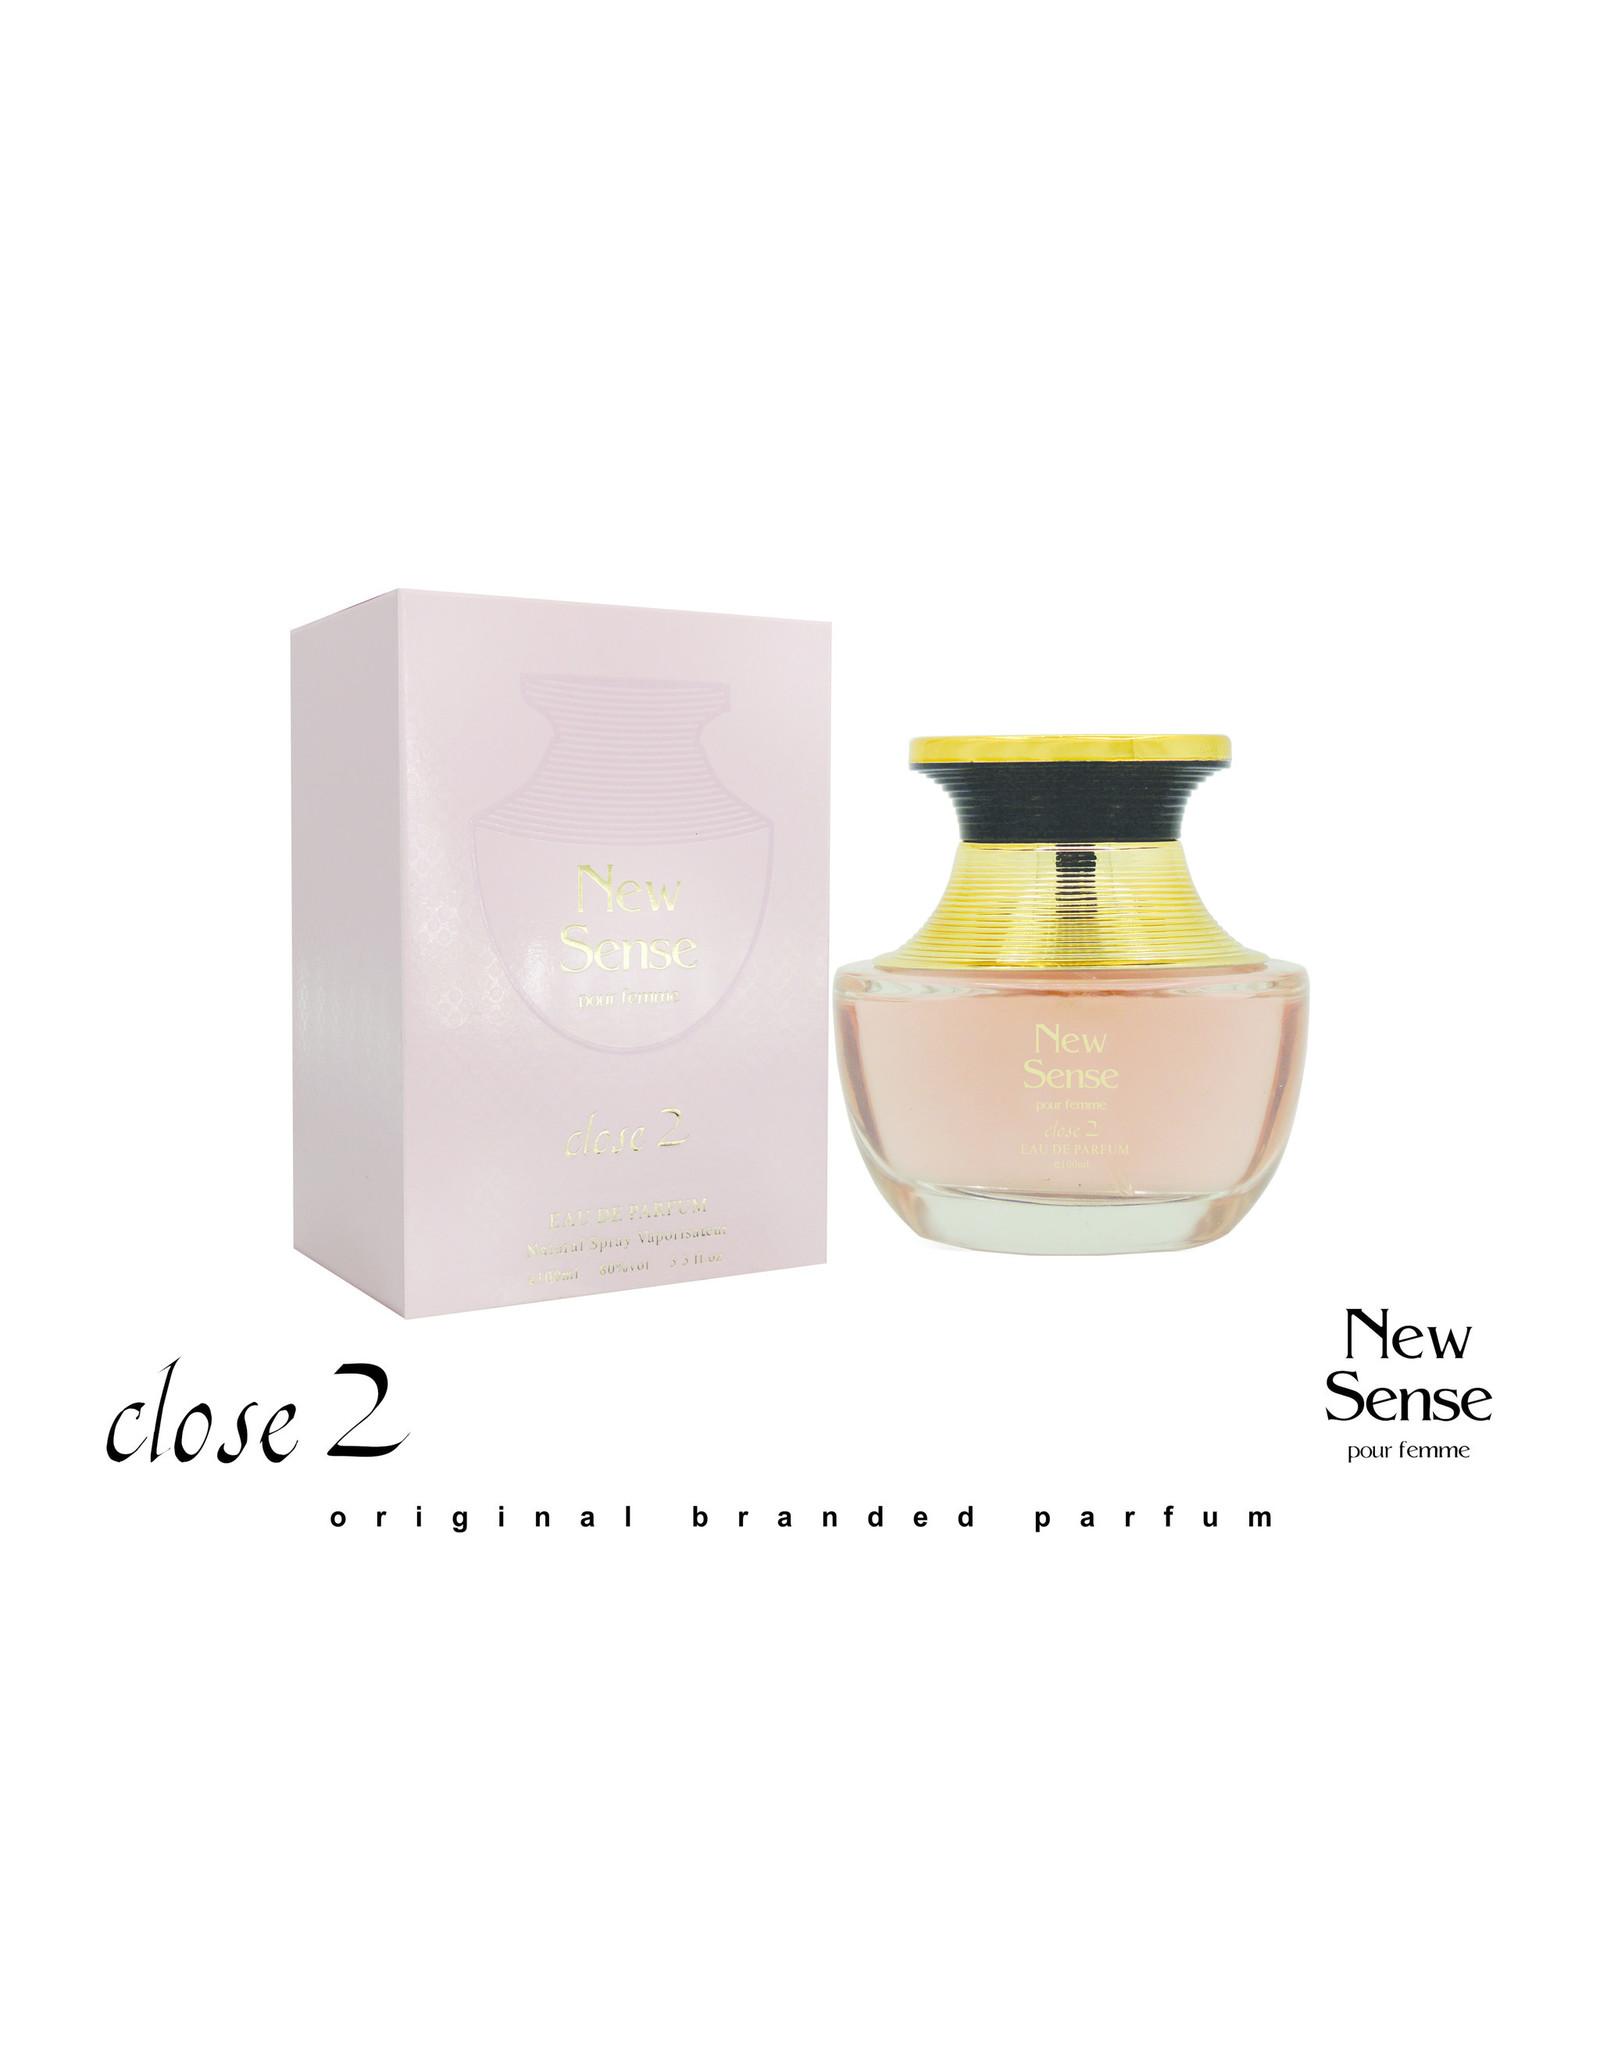 Close 2 parfums New sense ED 100 ml